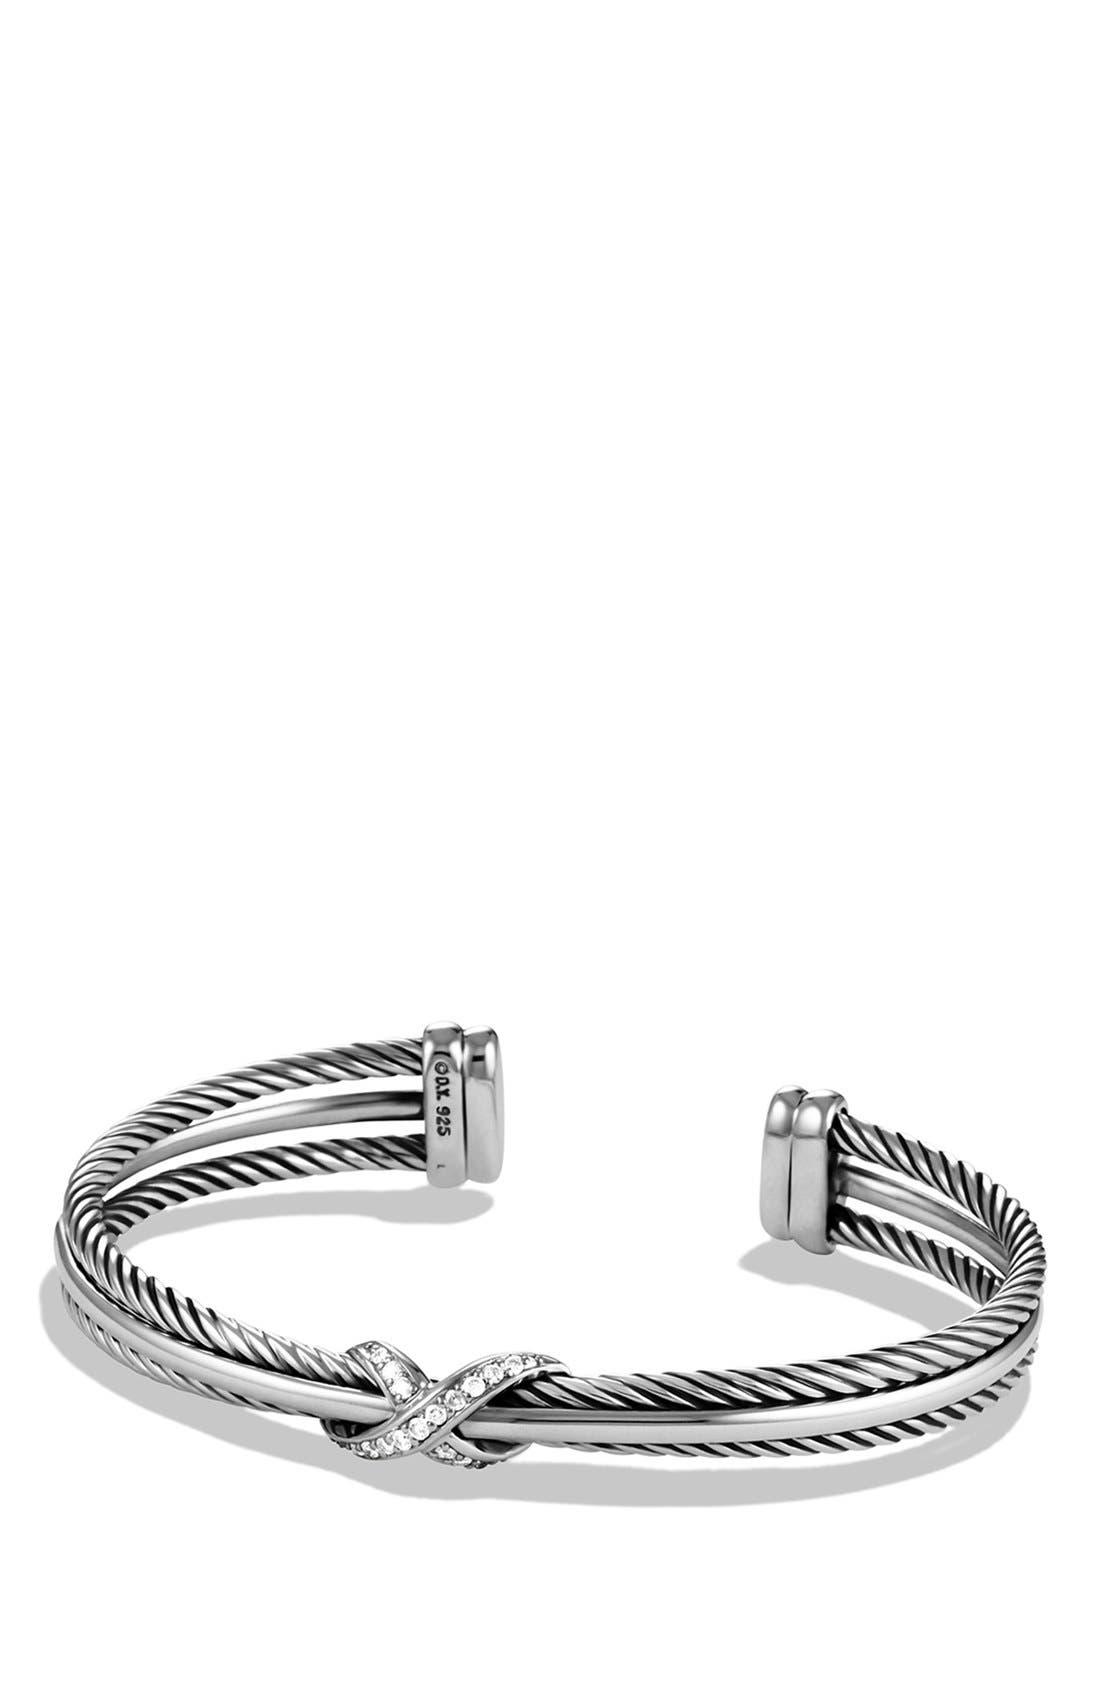 David Yurman 'X' Crossover Cuff with Diamonds